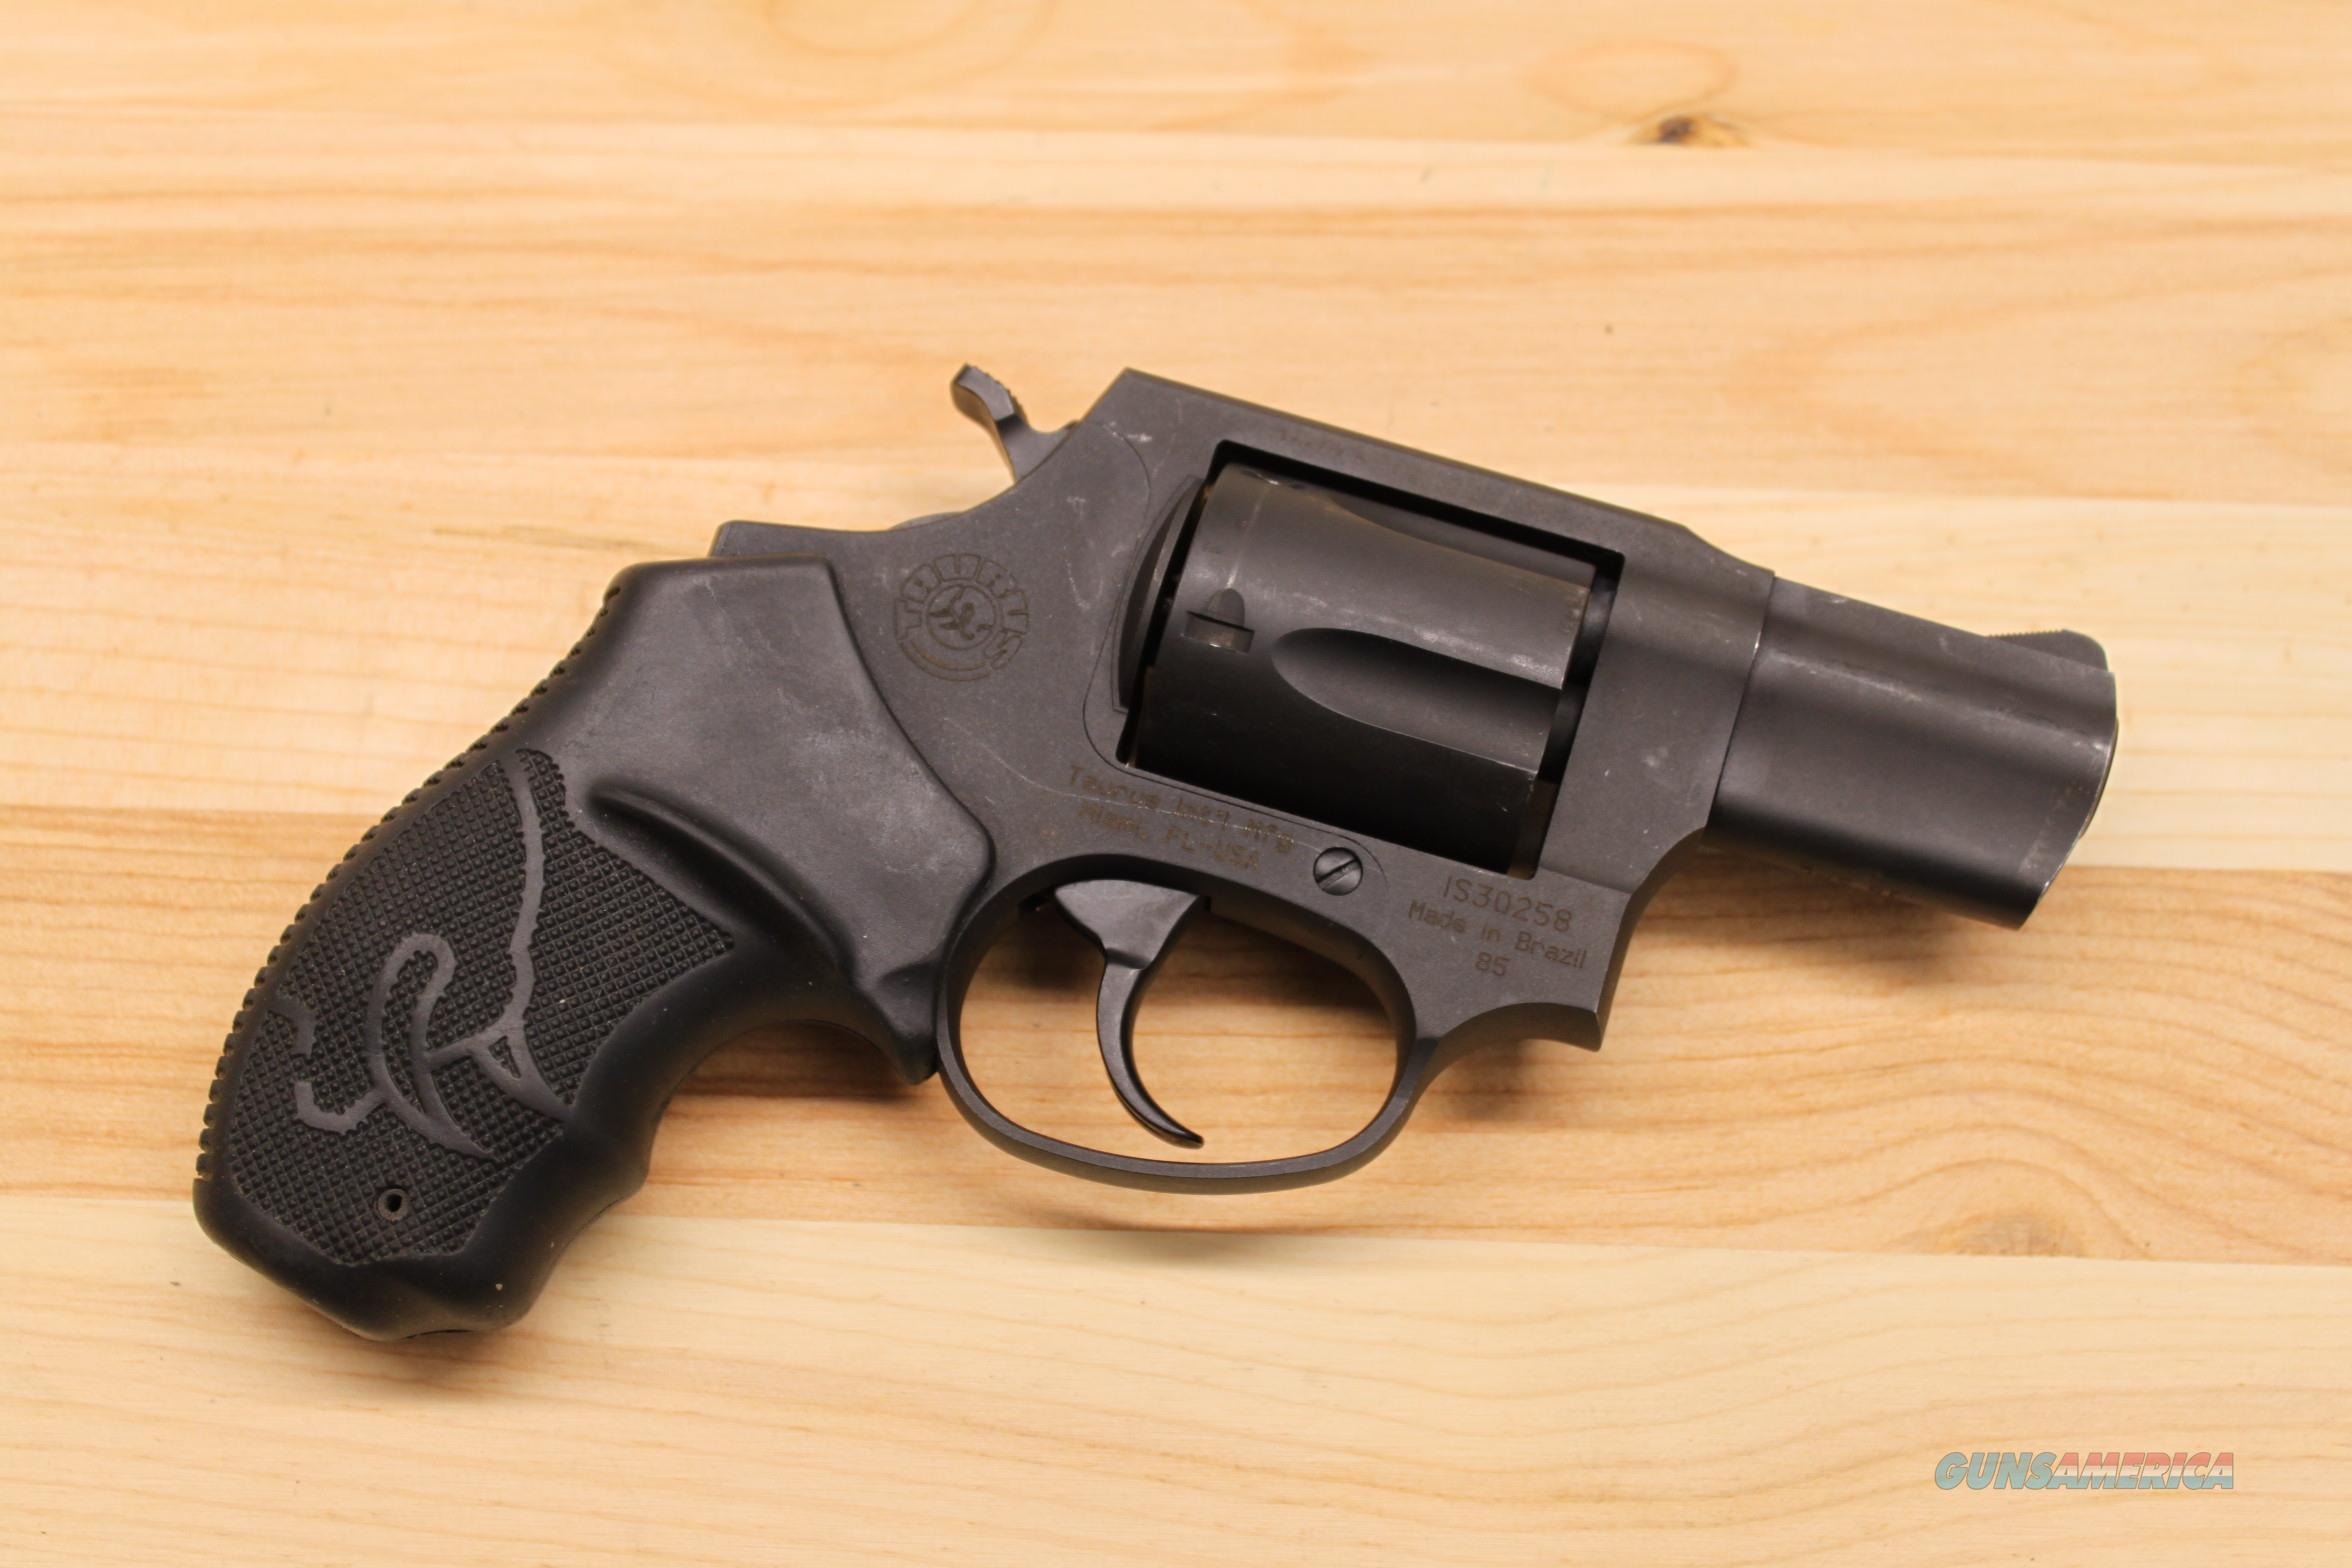 Taurus Model 85, 38 Special  Guns > Pistols > Taurus Pistols > Revolvers